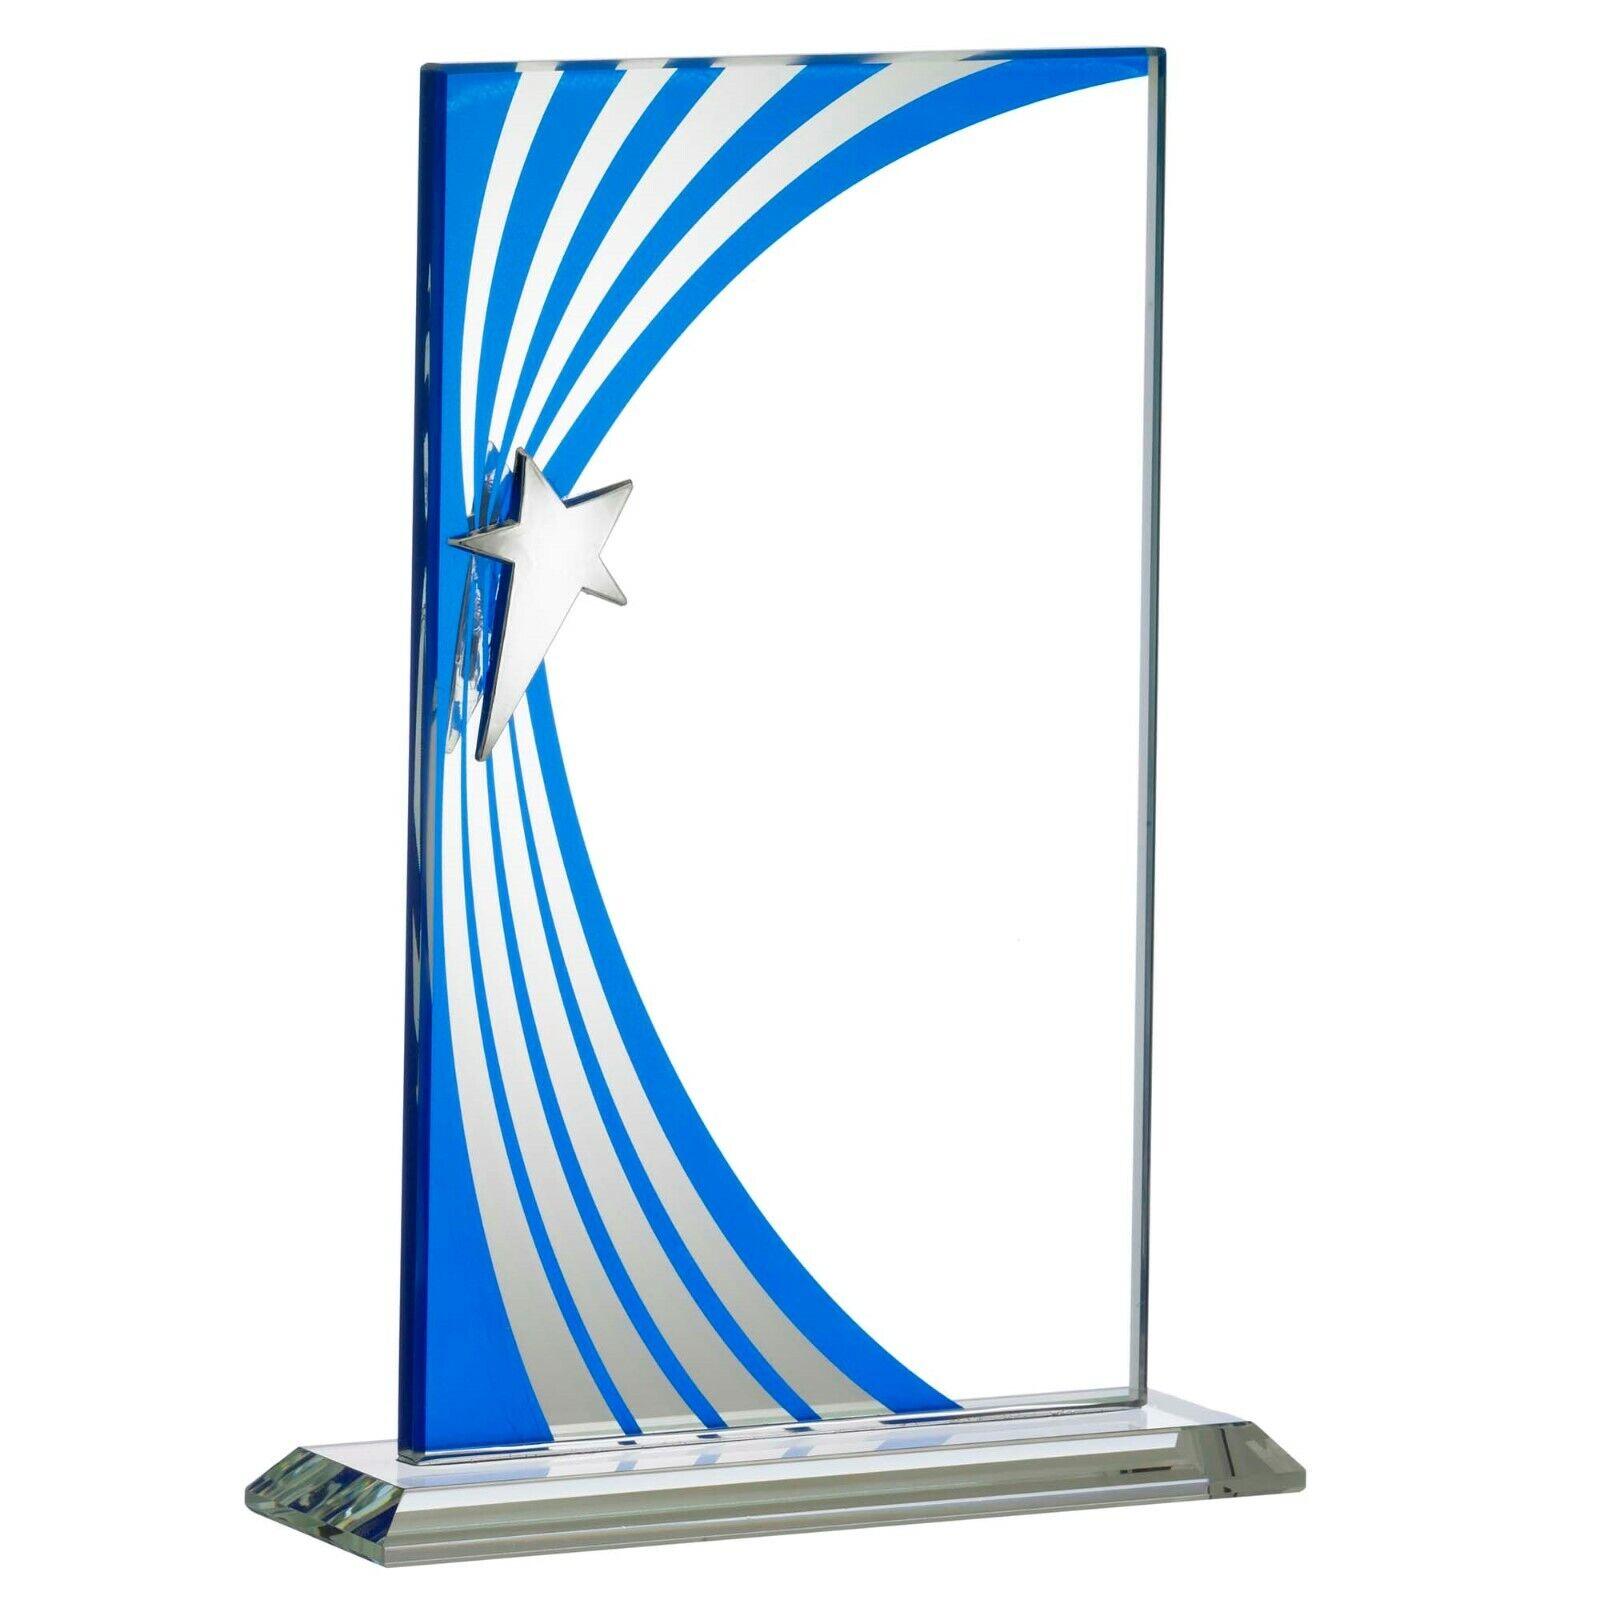 Blauw zilver Mirror Glass Rectangle Trophy Cast Metal Star GRATIS Gravin Box